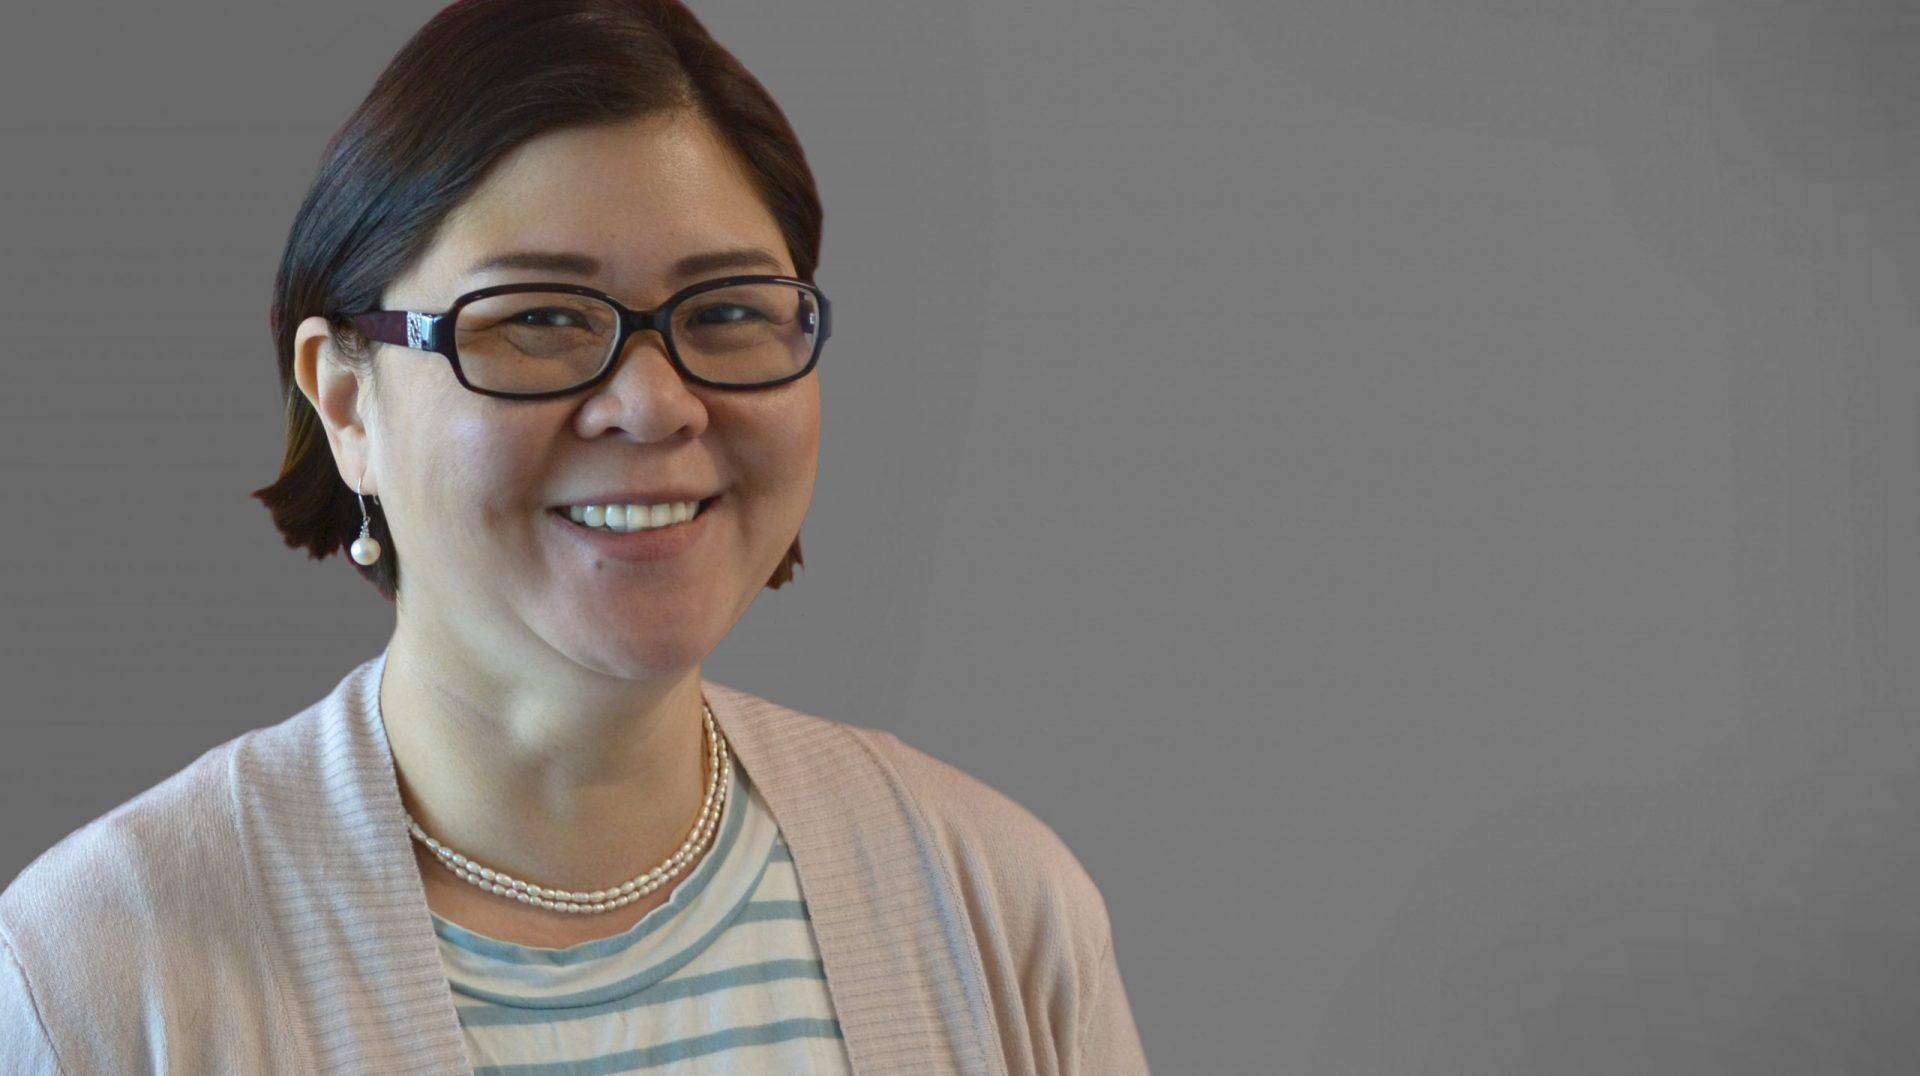 Rachel Clemente Joins Sacramento Studio as Design Leader